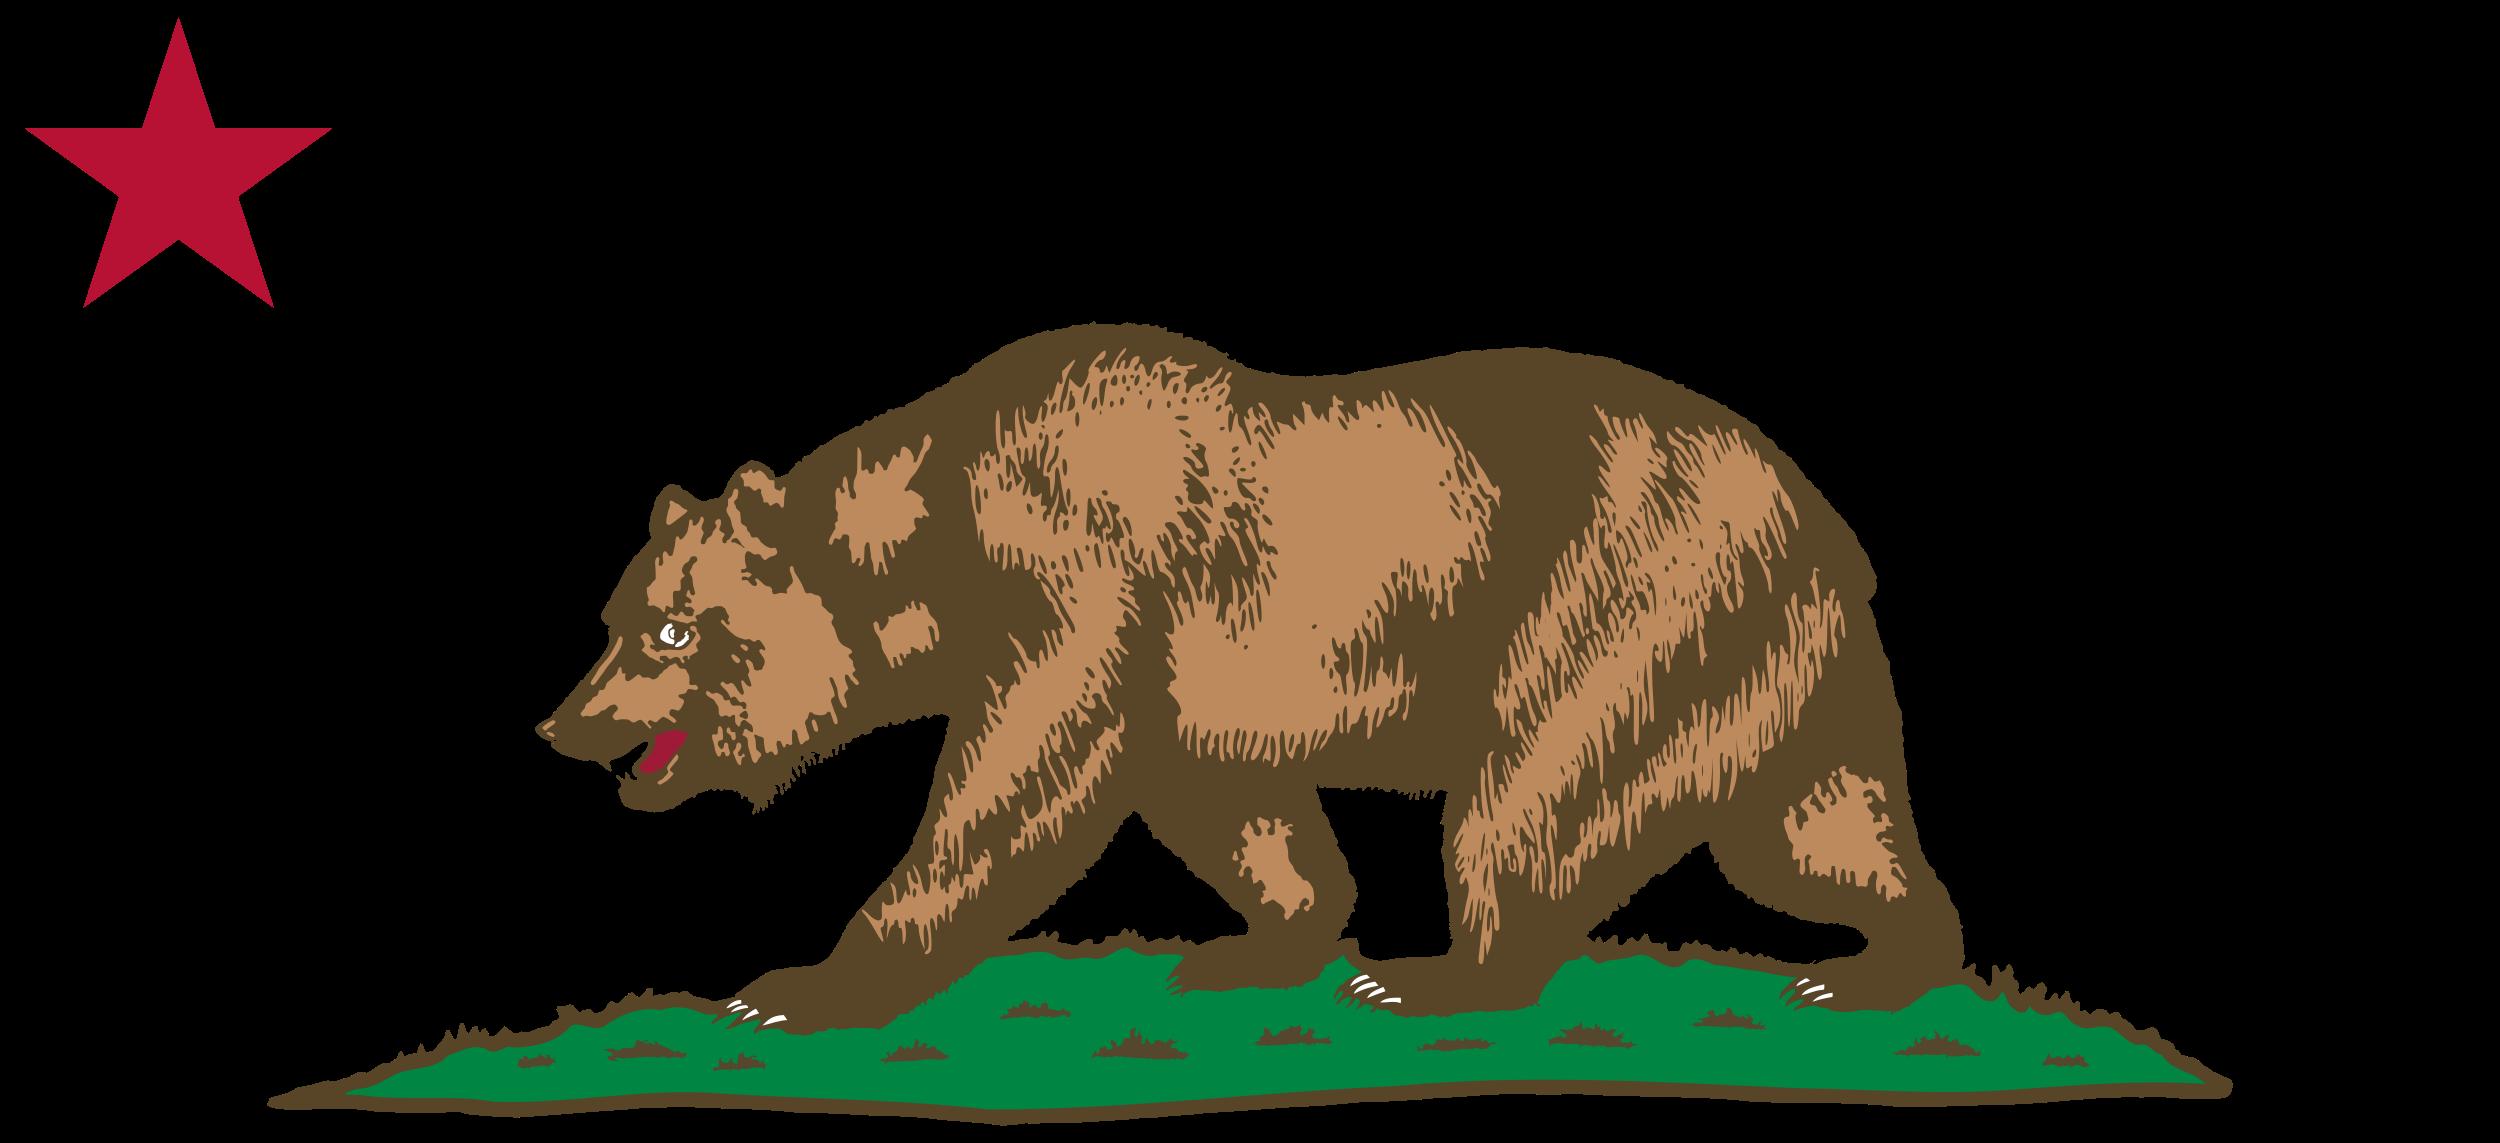 Bear eating fish clipart vector freeuse download clipart flag of california star bear plot_bclipart - BClipart vector freeuse download